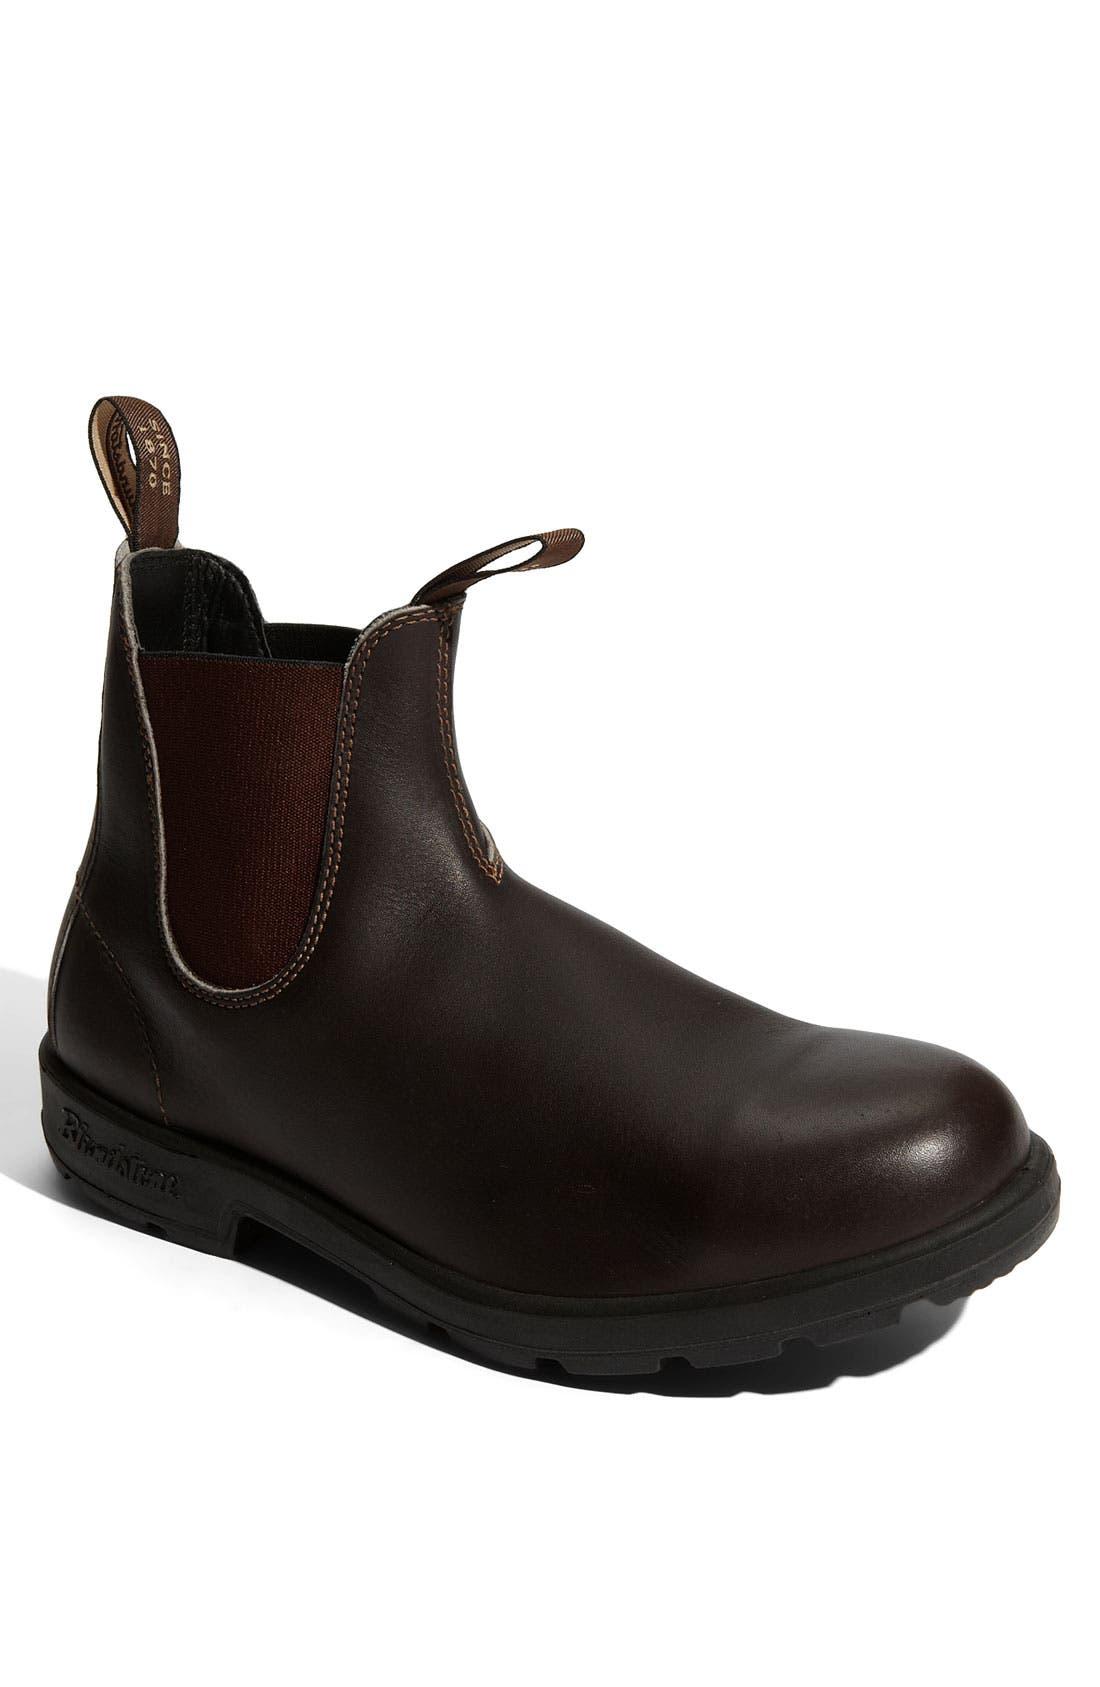 Classic Chelsea Boot